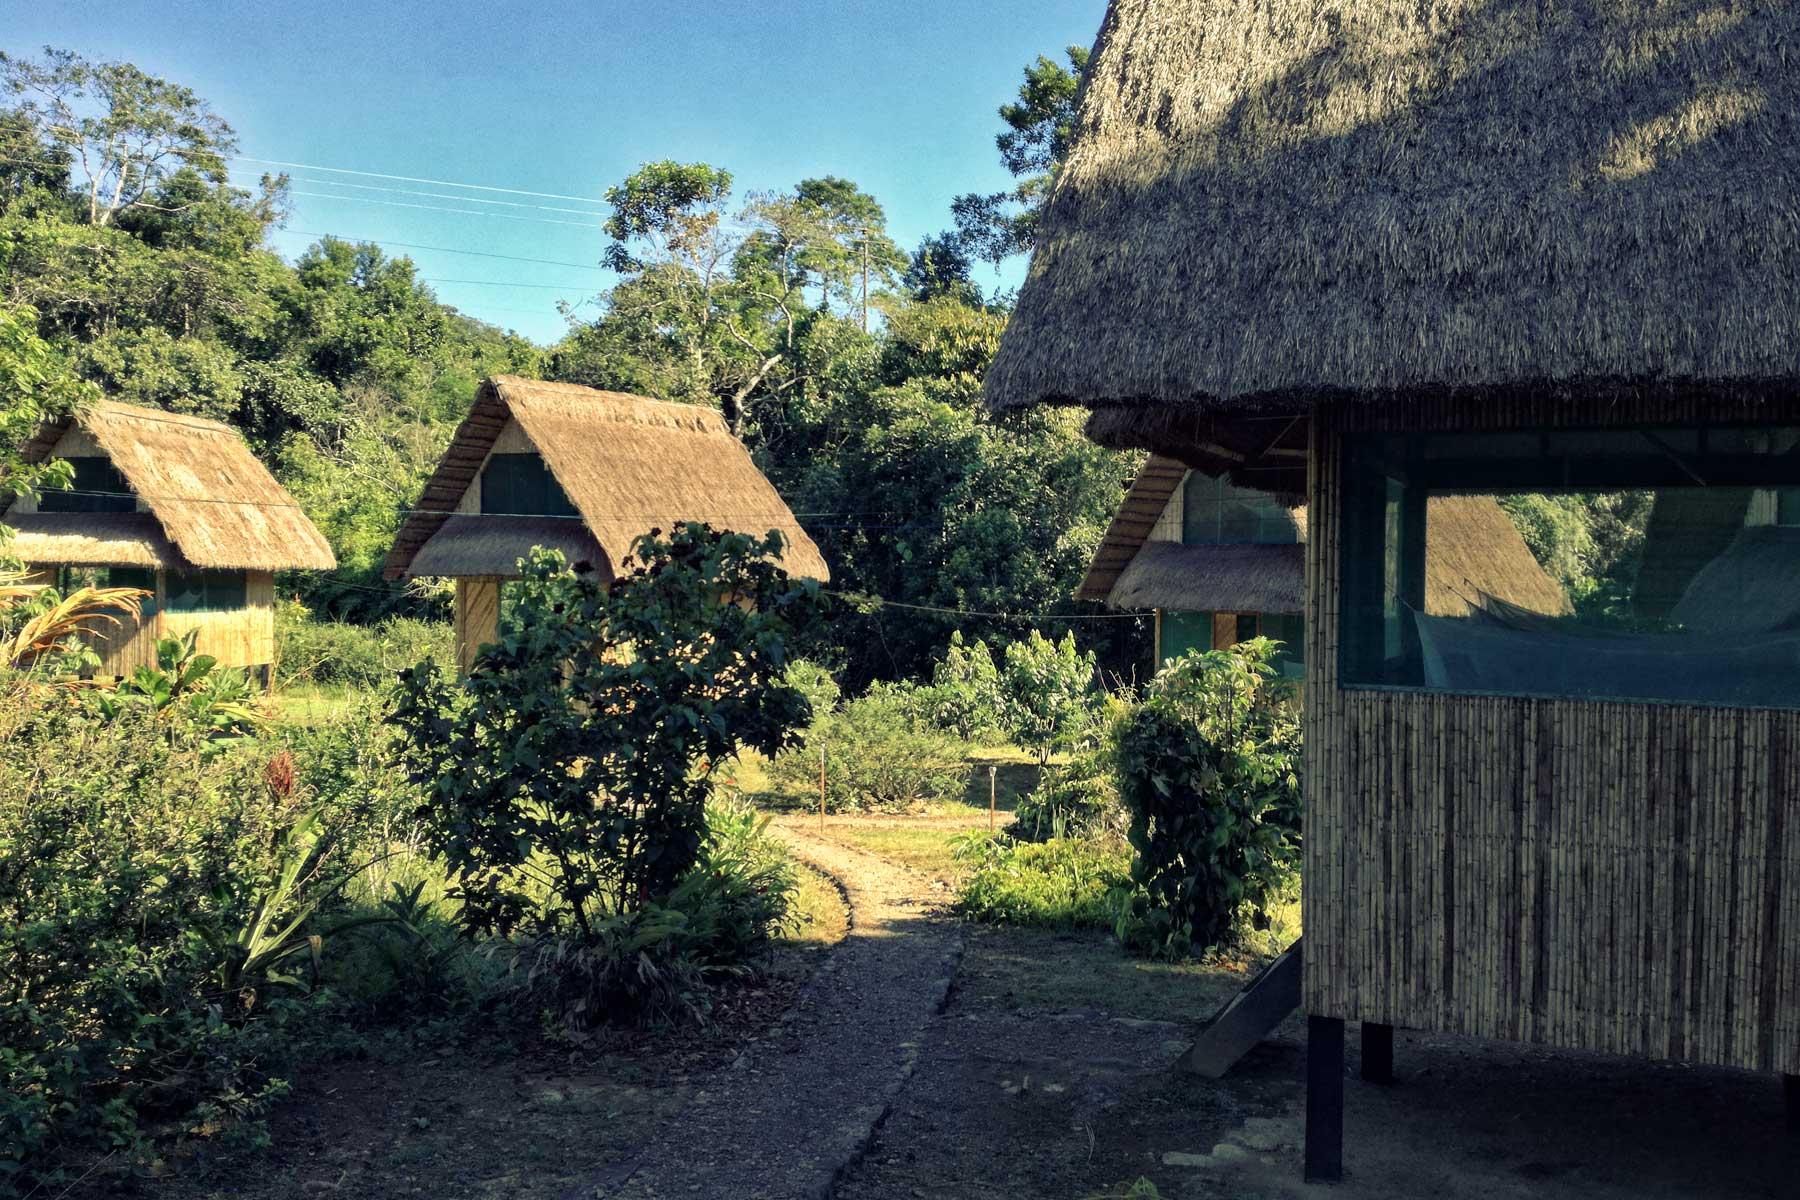 Lodge alojamiento selva Manu Perú